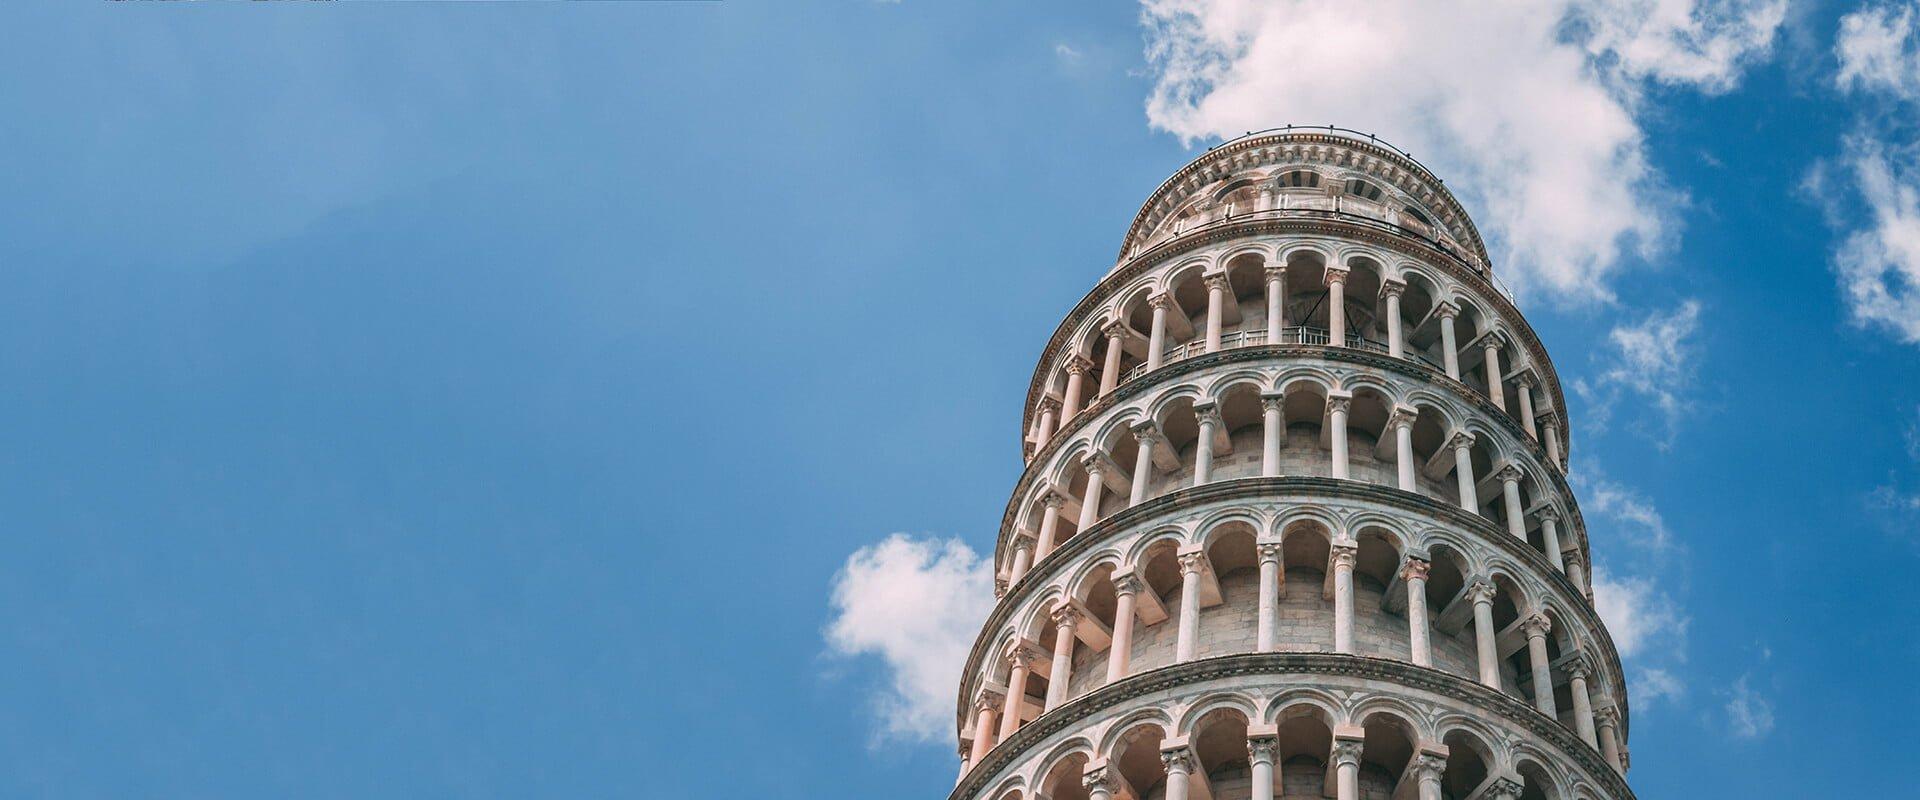 La Torre pendente di Pisa